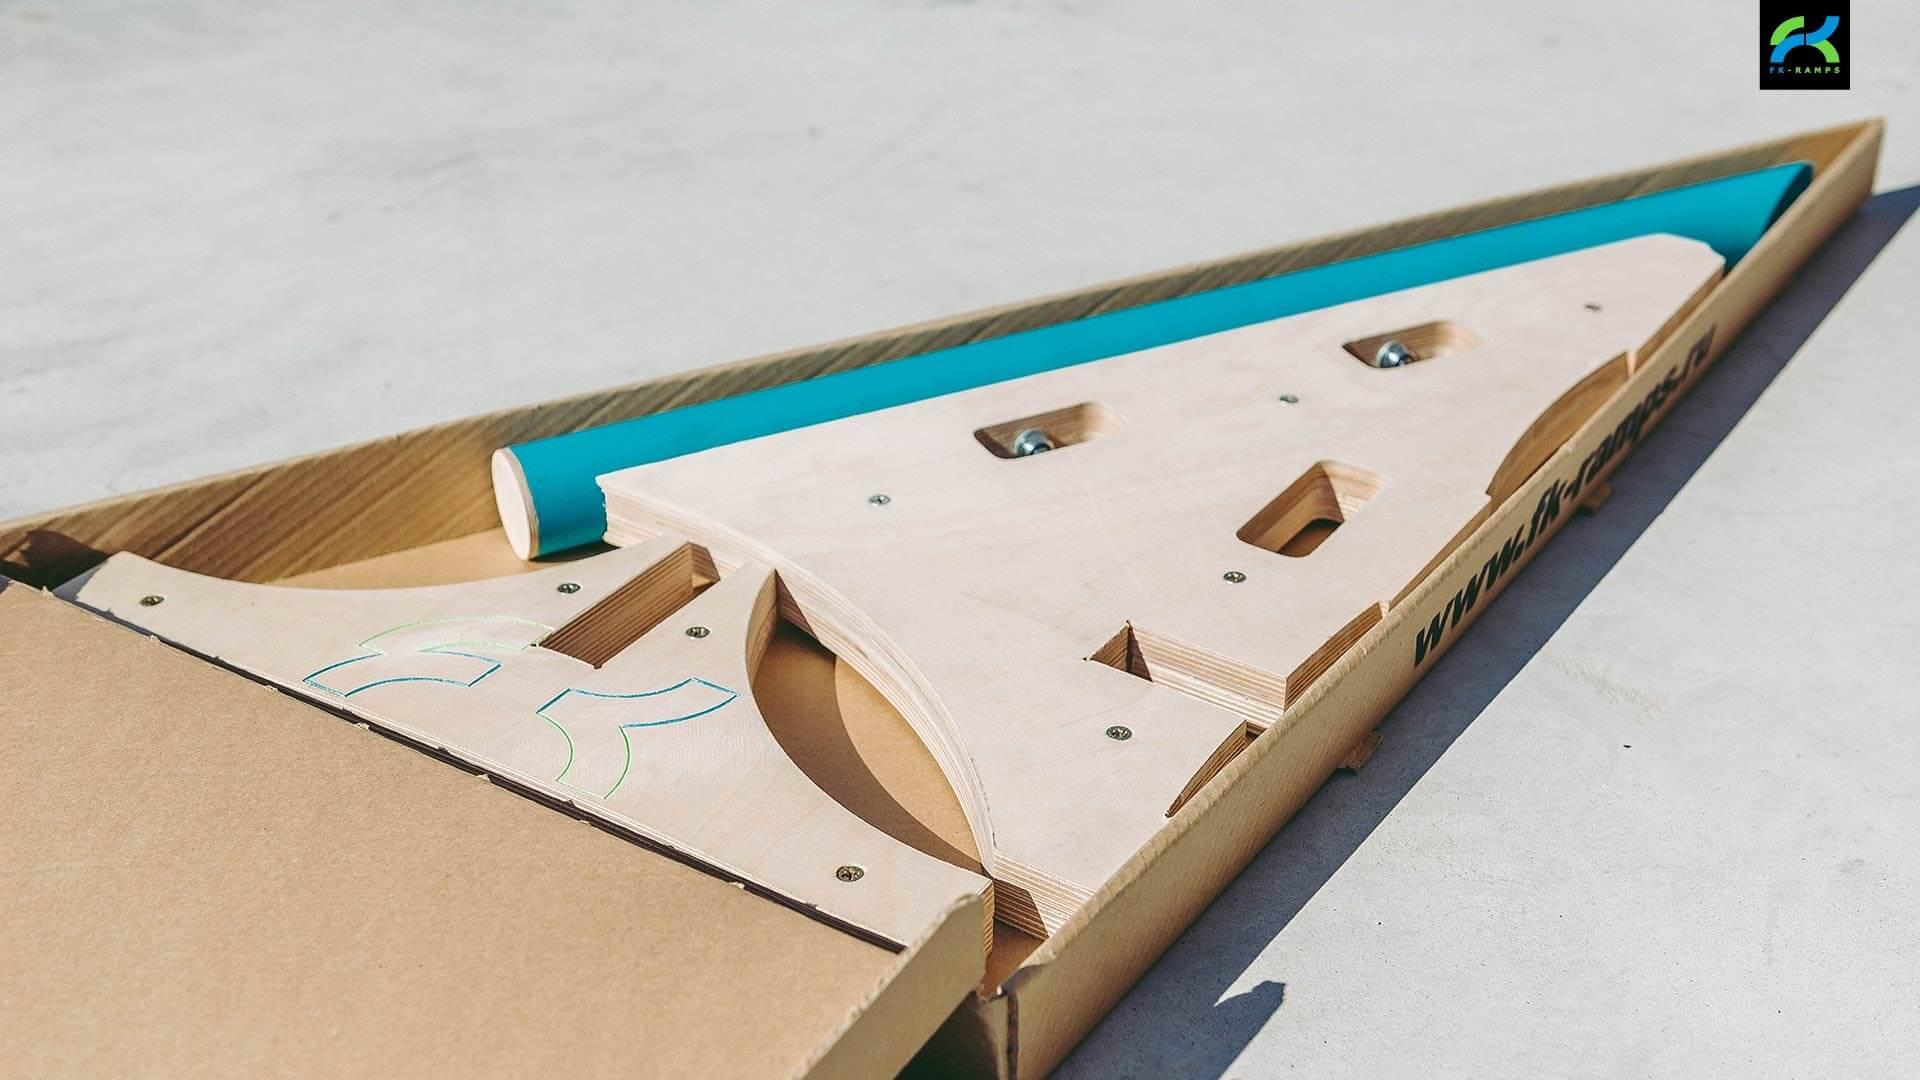 Набор для трюков на скейте - FK-ramps